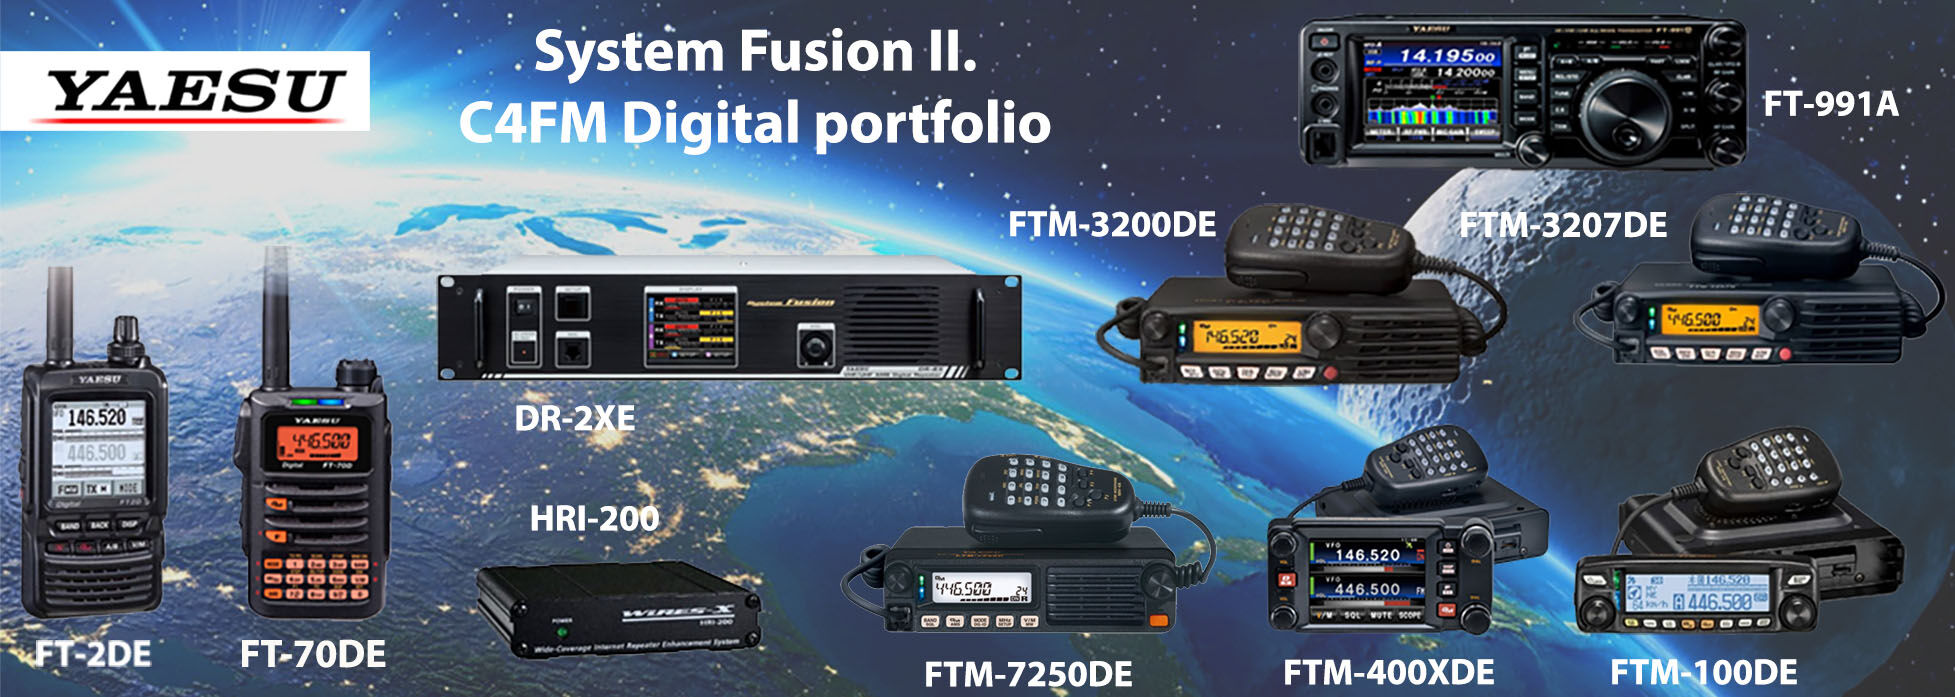 system fusion